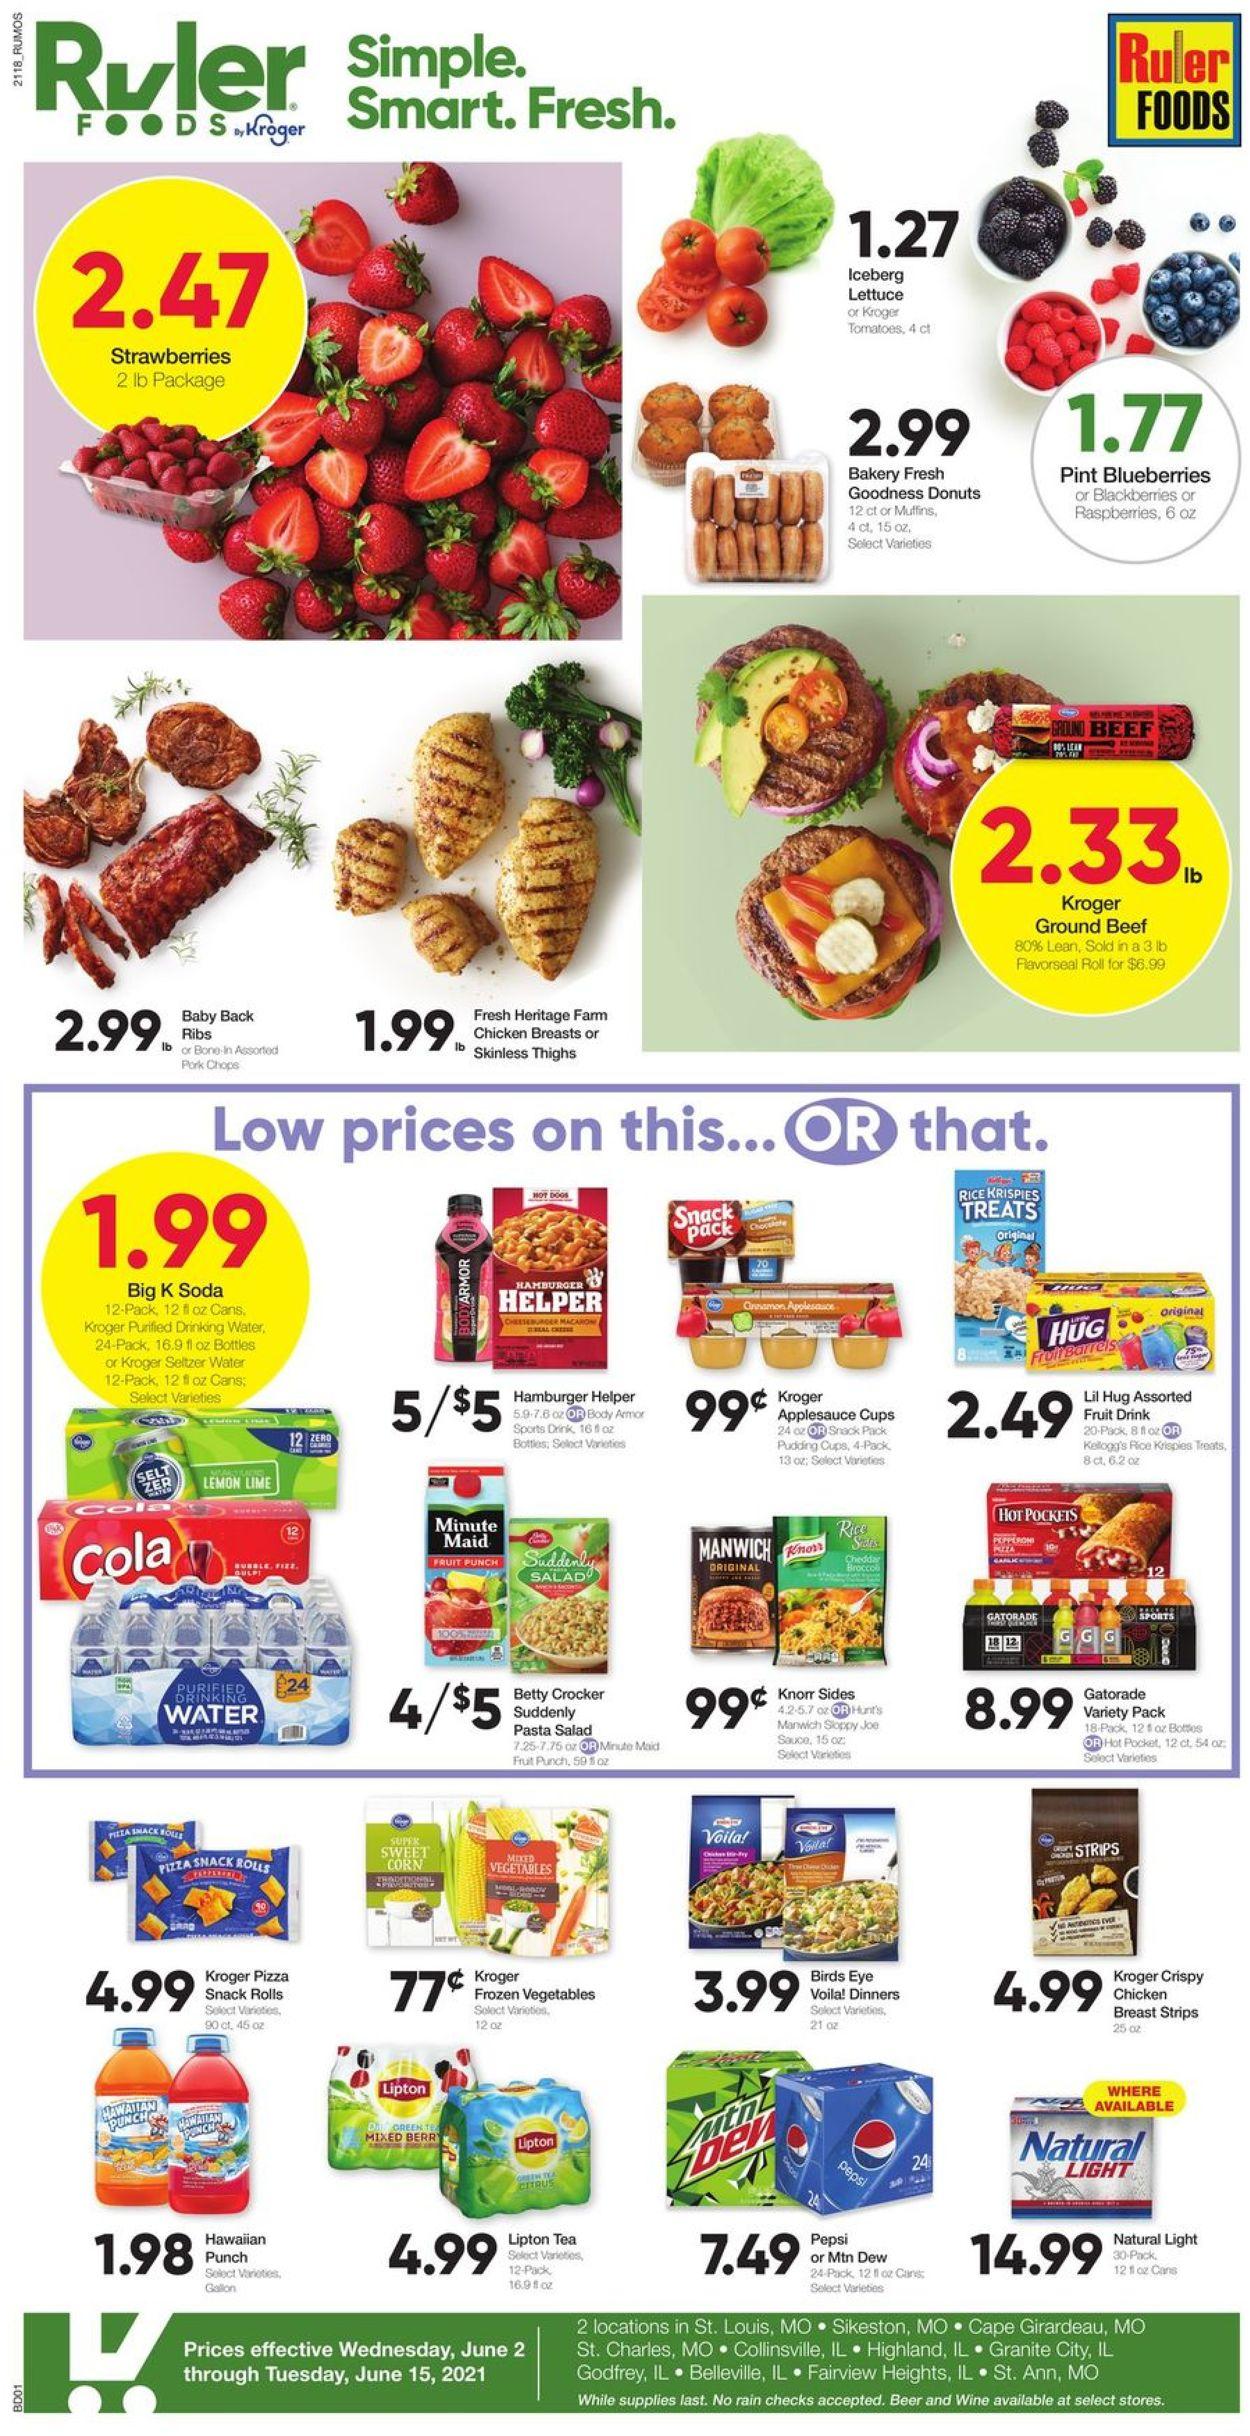 Ruler Foods Weekly Ad Circular - valid 06/02-06/15/2021